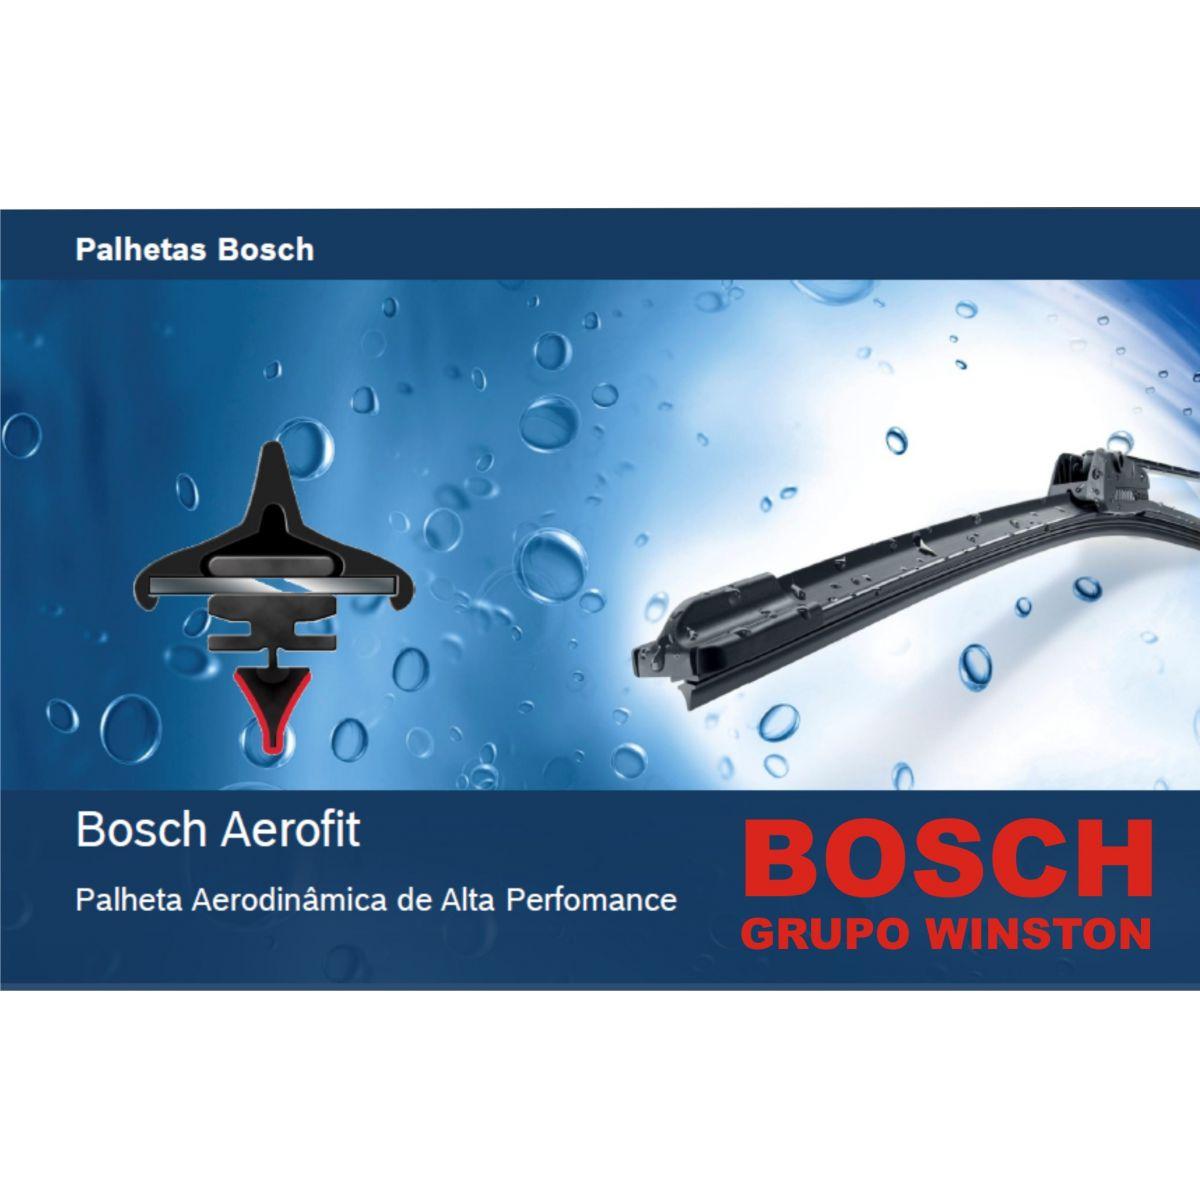 Palheta Bosch Aerofit Limpador de para brisa Bosch JAGUAR XJ8 XK8